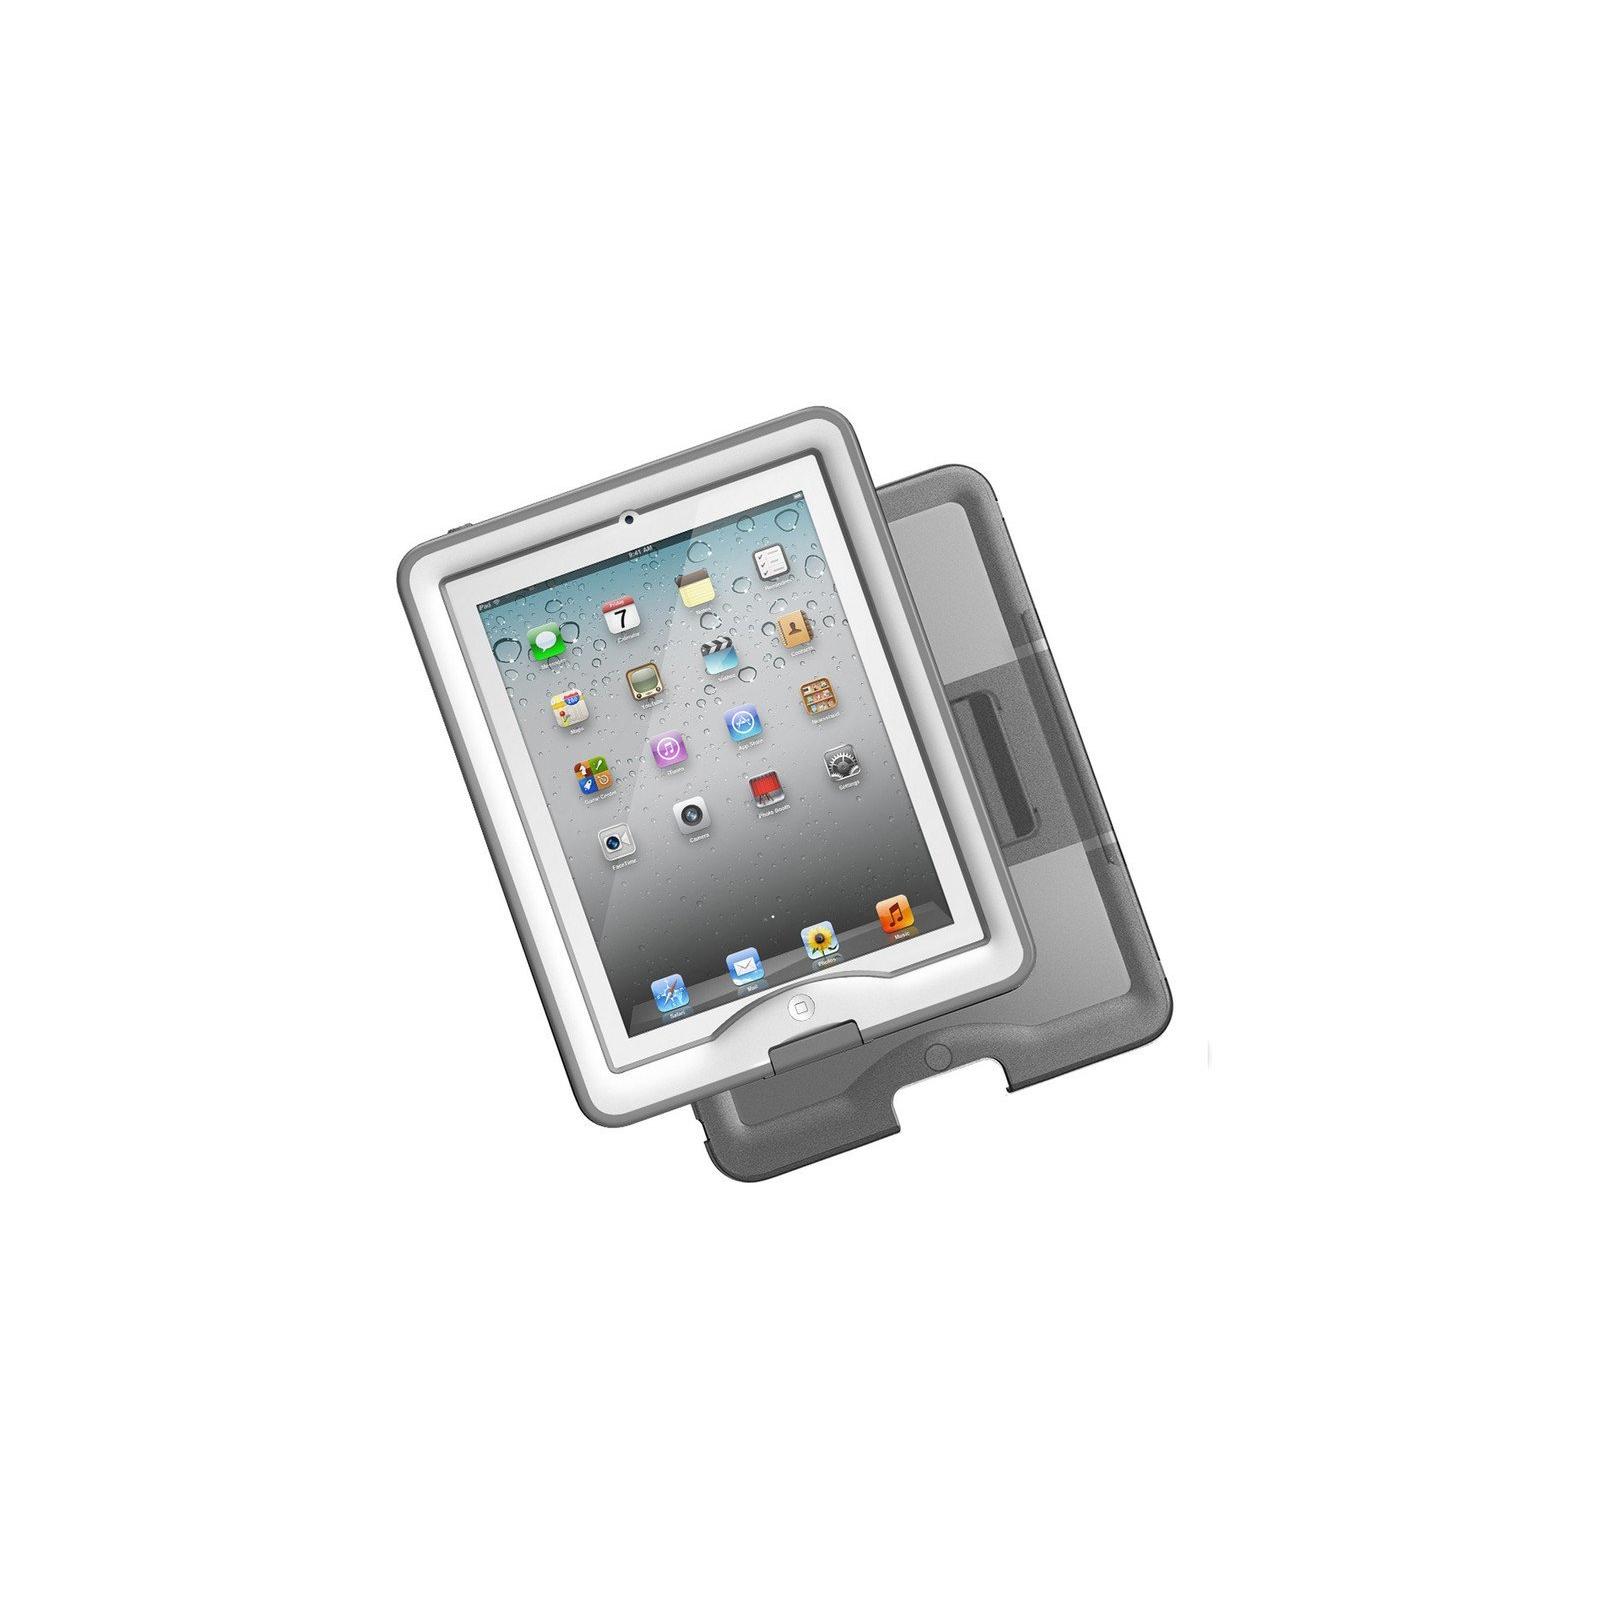 Чехол для планшета Belkin iPad4 LifeProof Case & Cover/Stand (1109-02) изображение 5